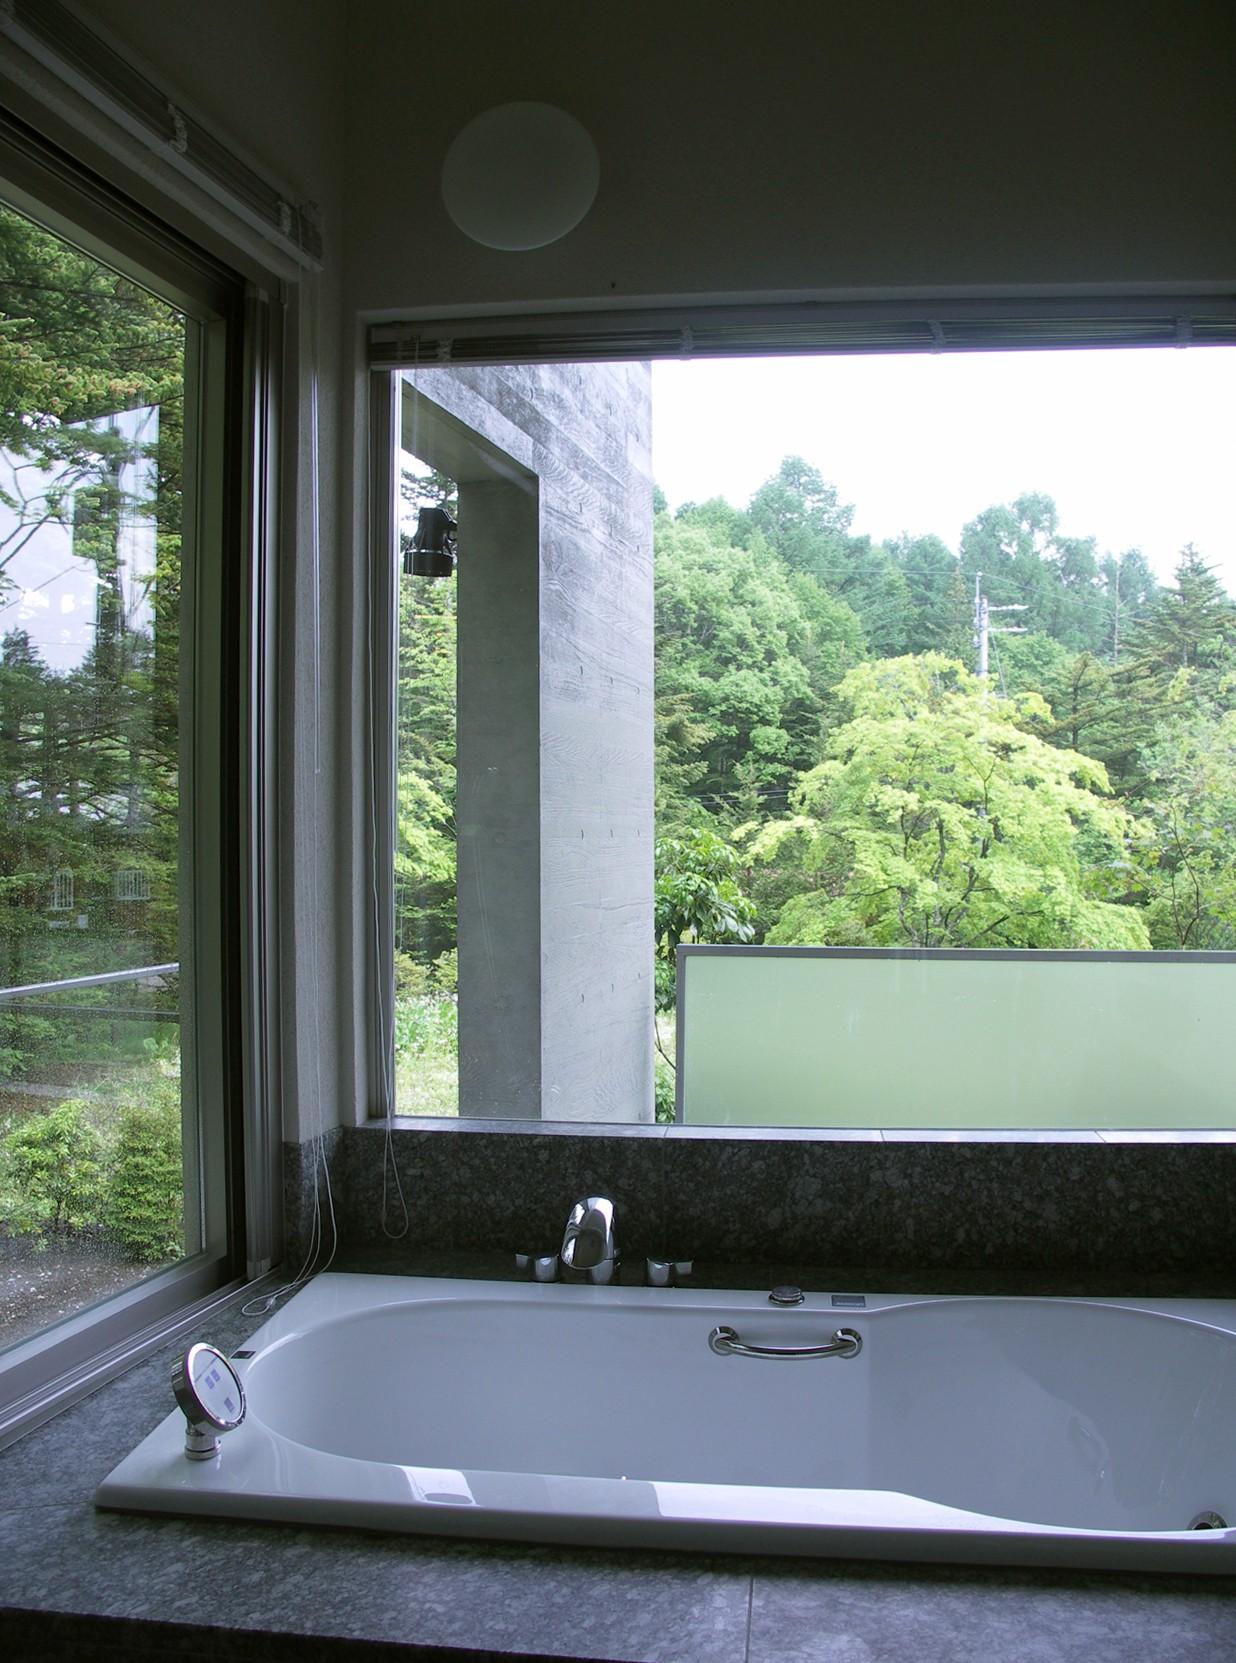 VILLA NAKAKARUIZAWA (浴室から外を見た様子)